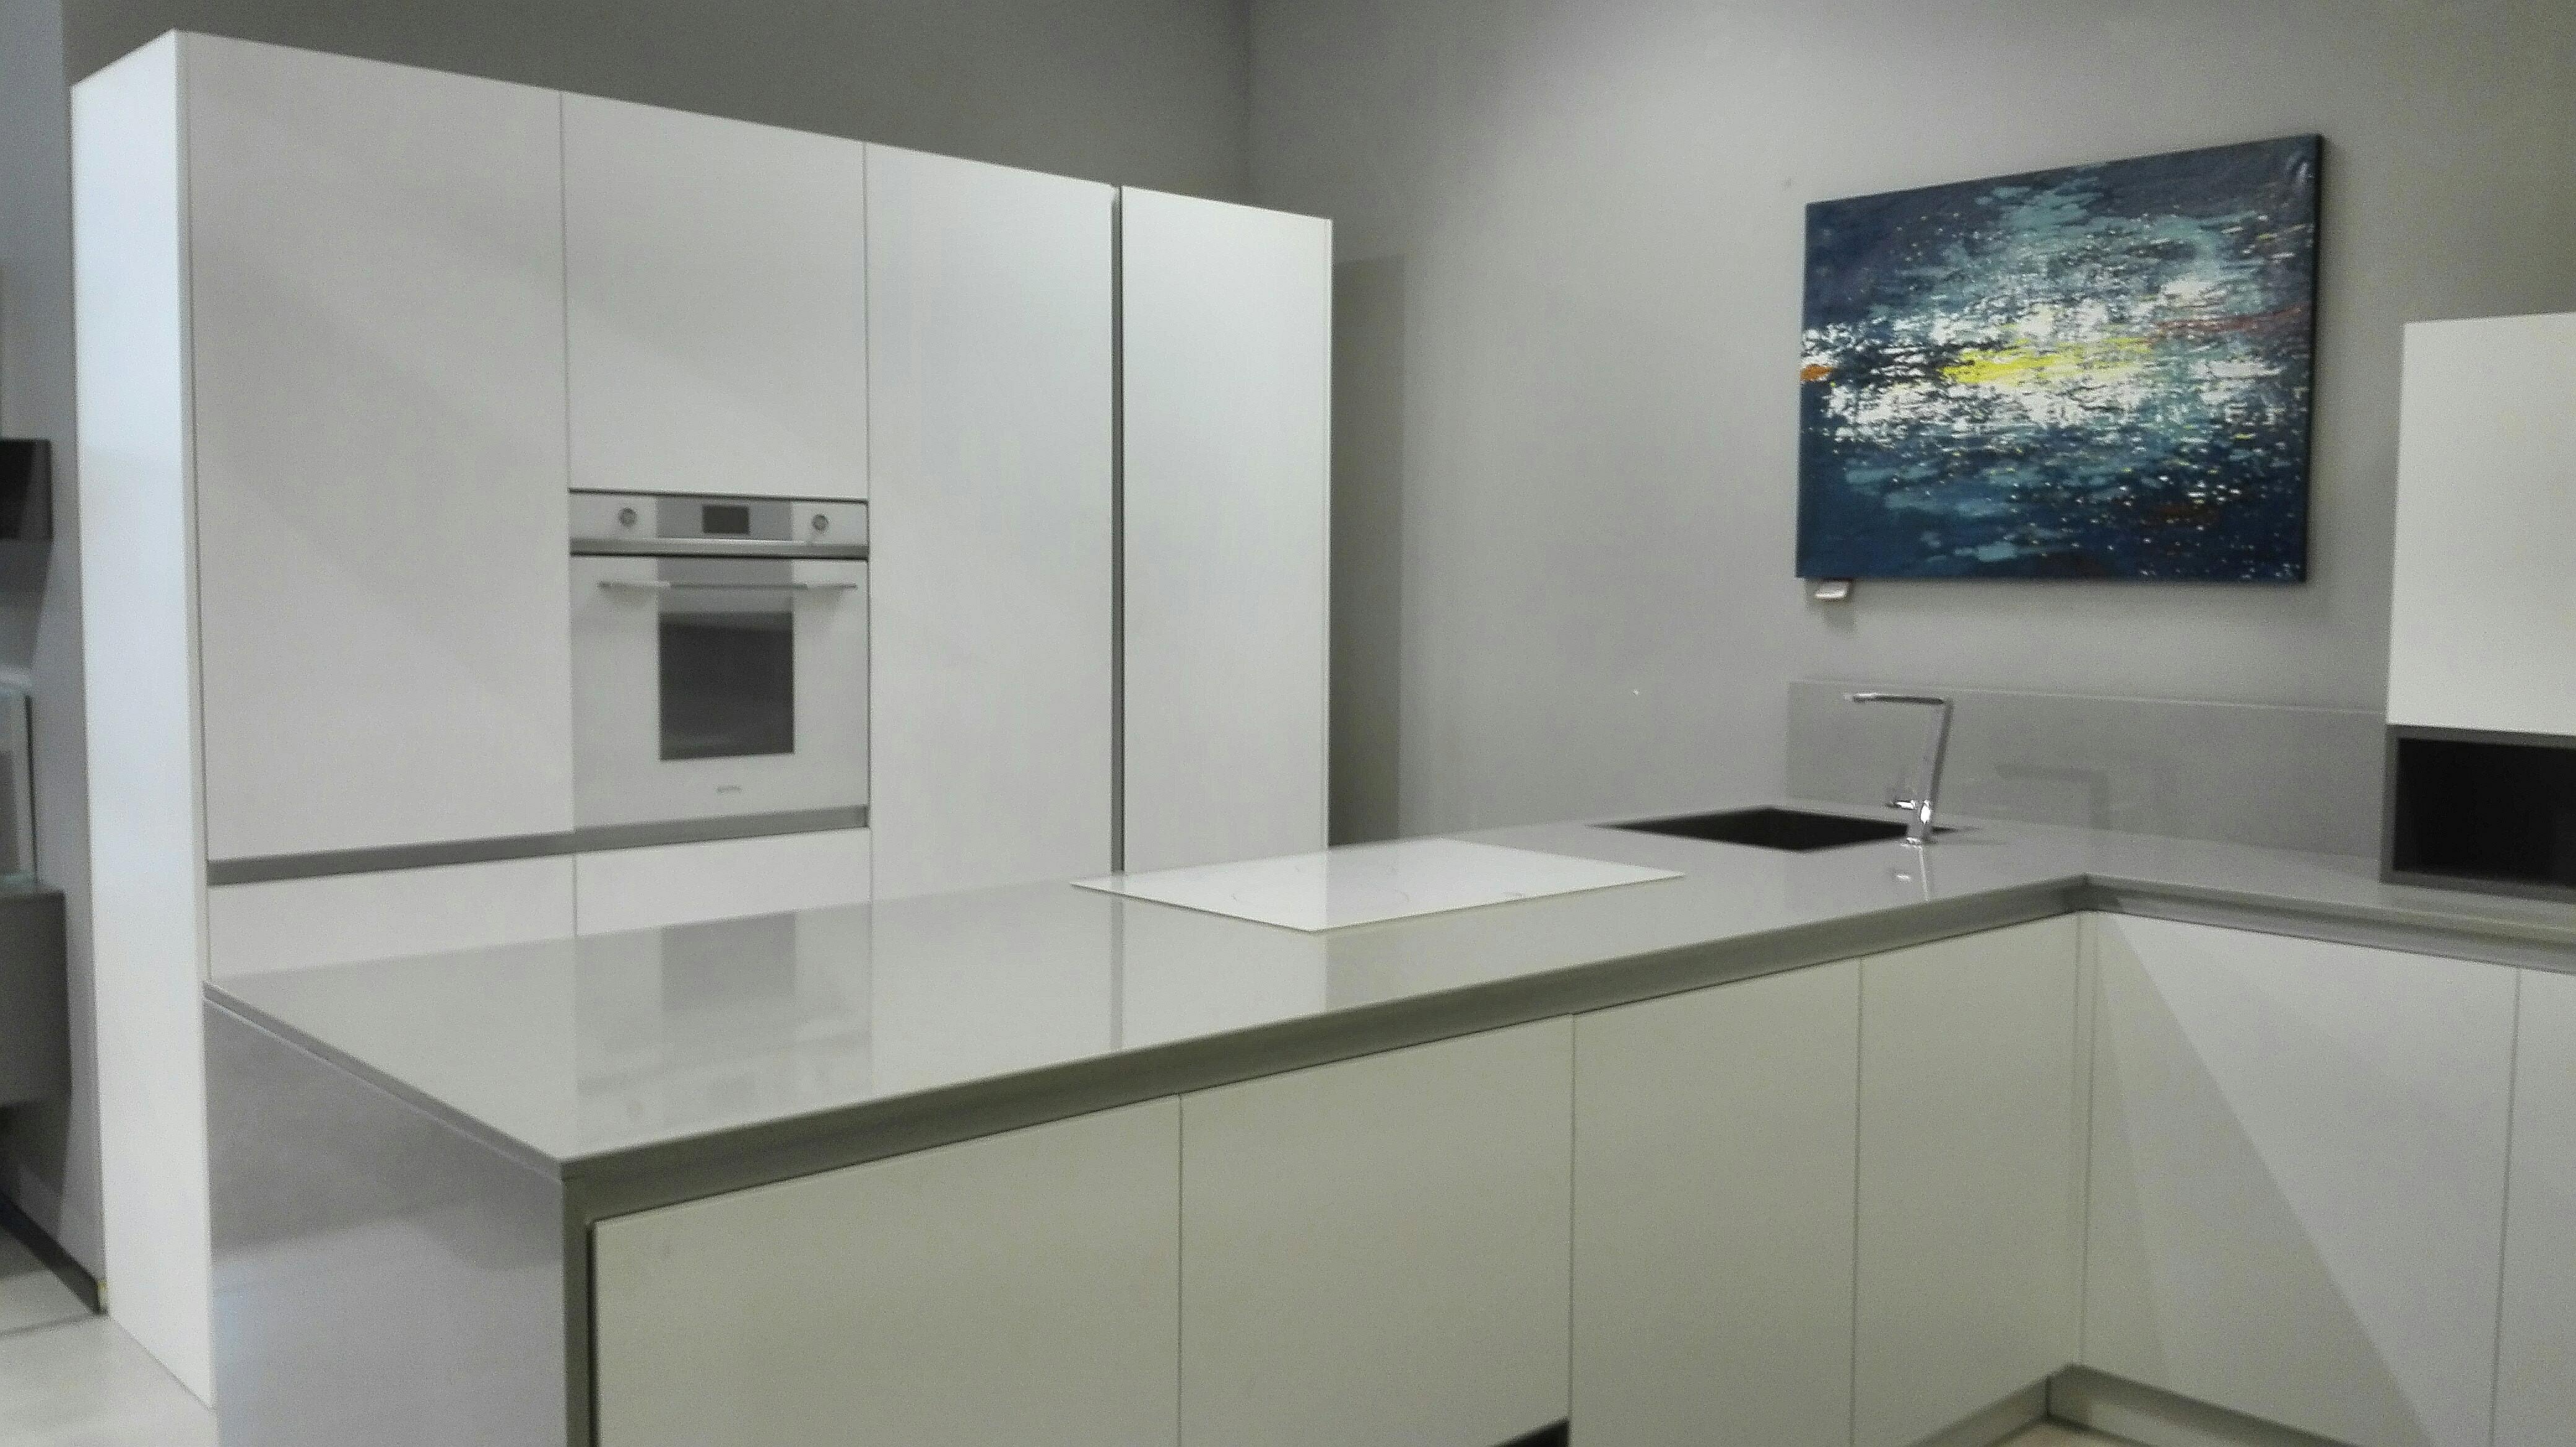 Cucina Kalì by Arreo3 bianco opaco, gole grigio, piano Okite ...